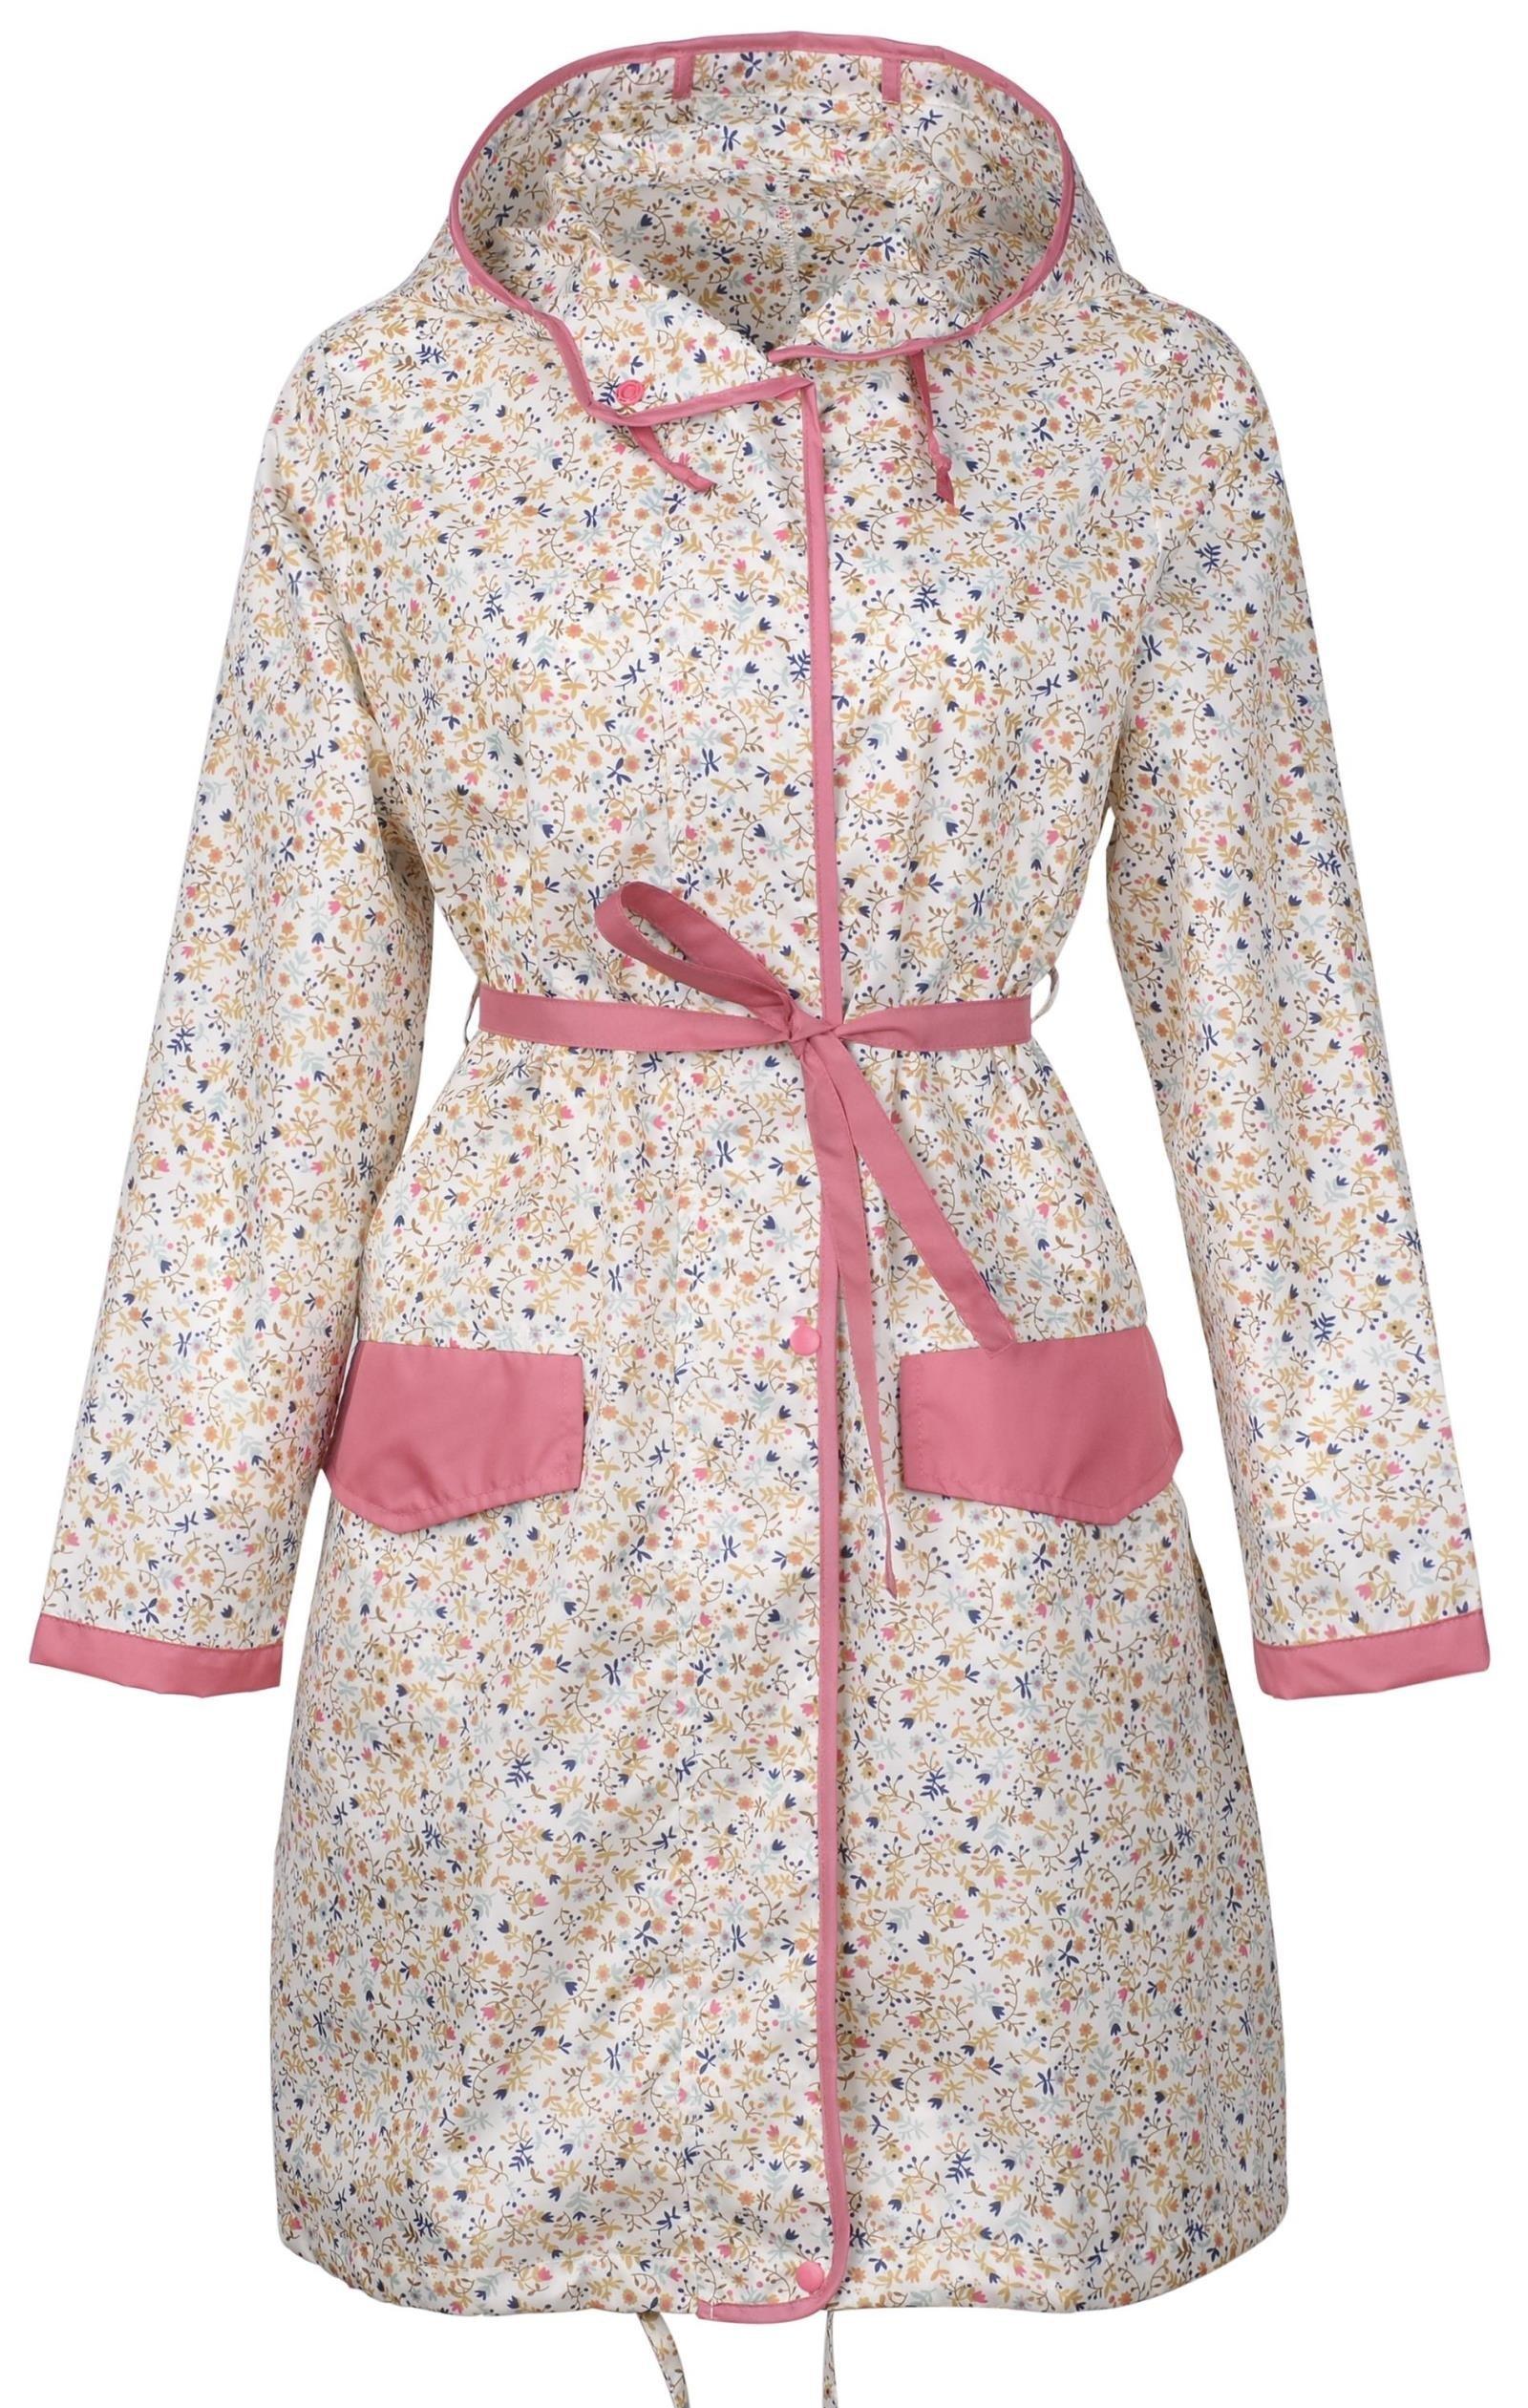 Freesmily Women Fashion Japanese Korean Style Cute Windbreaker Waterproof Raincoat Rain Poncho